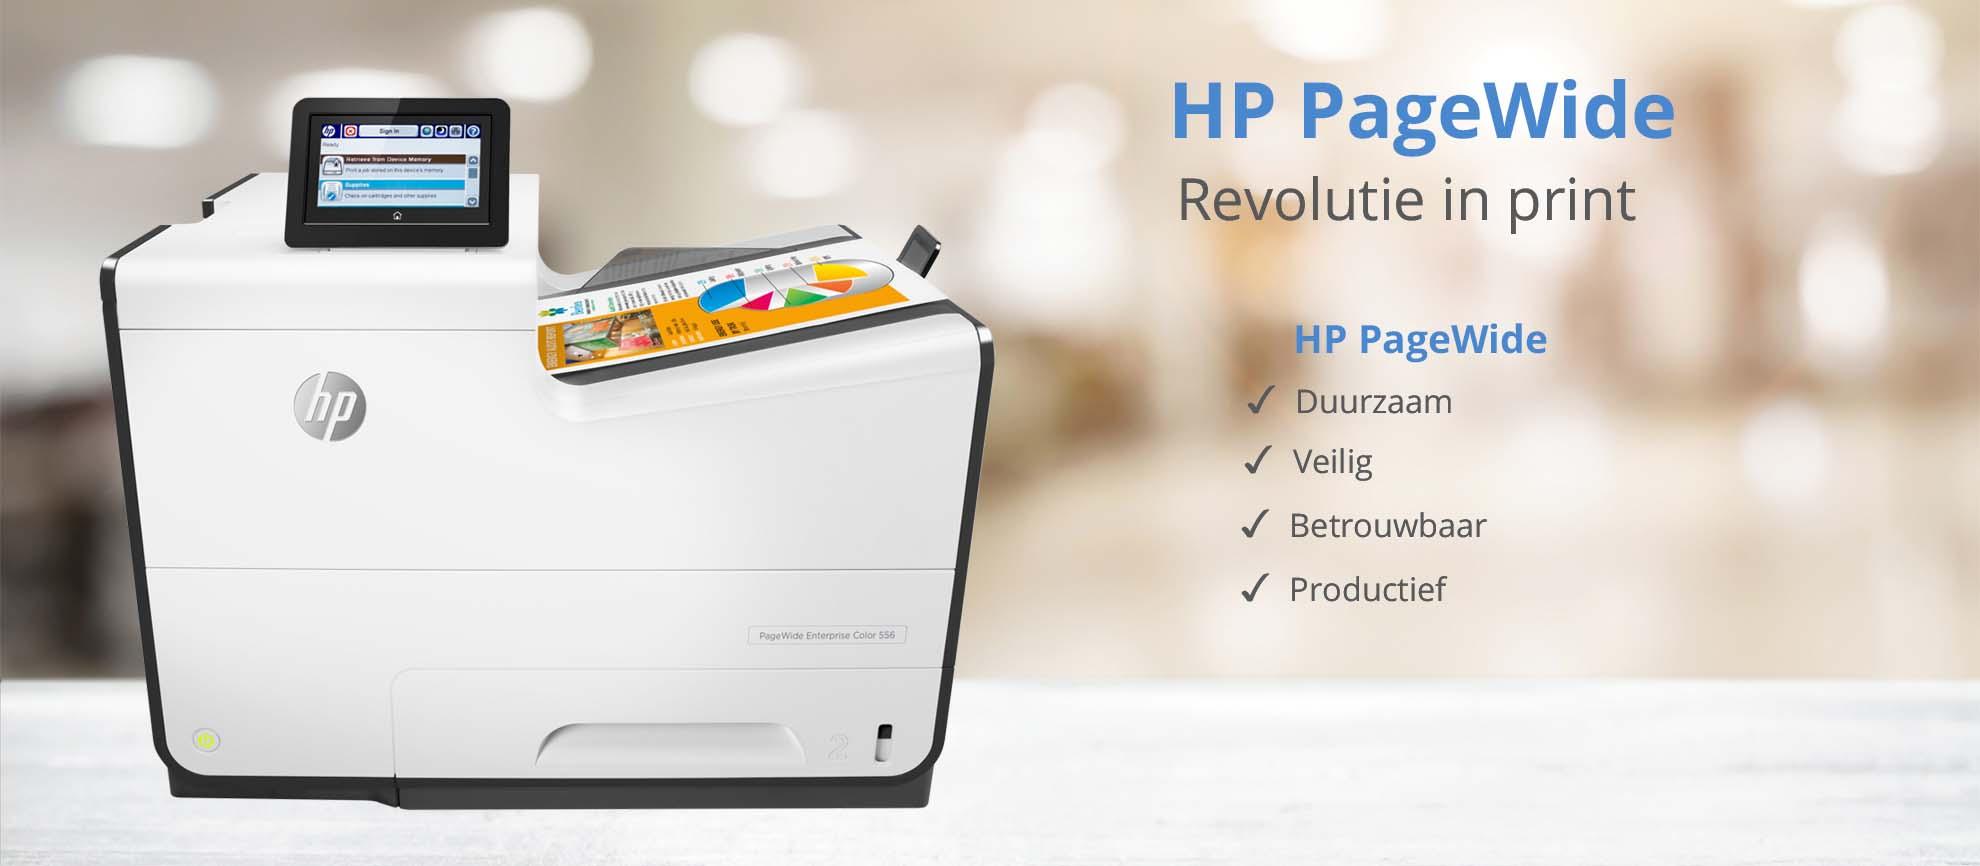 HP PageWide revolutie in print